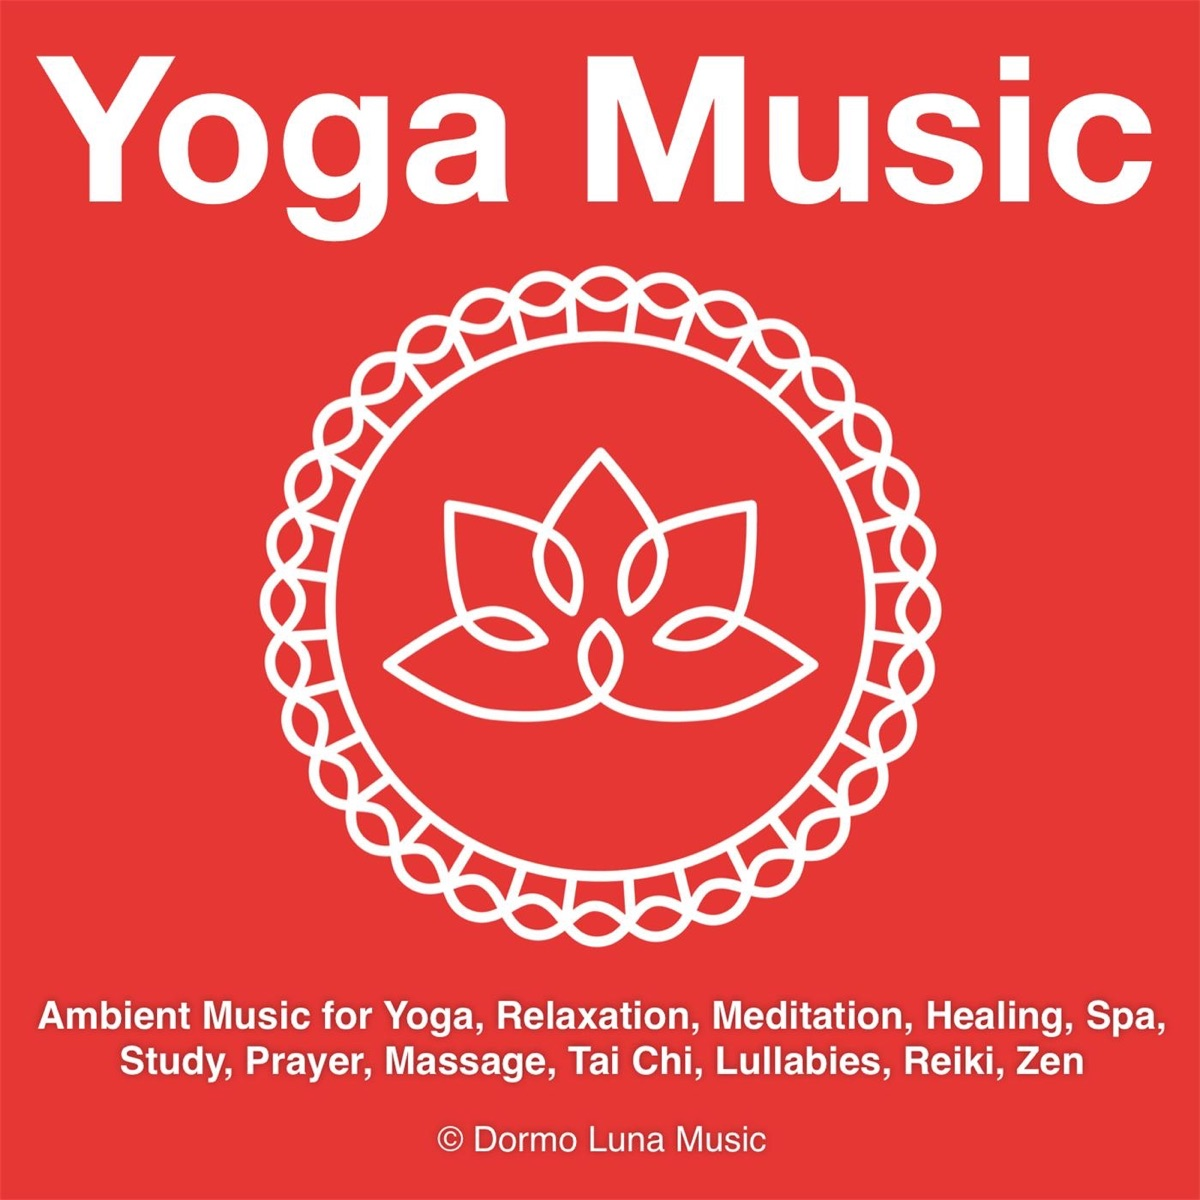 Yoga Music Album Cover by Dormo Luna Music